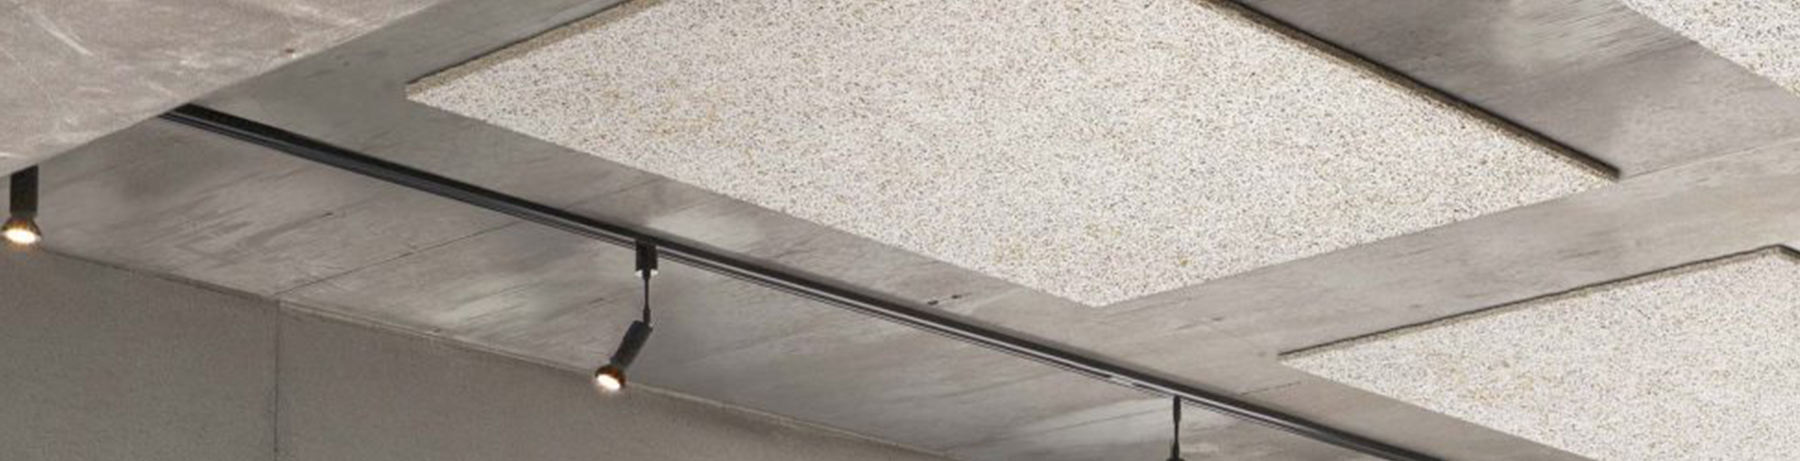 Ceiling Tiles - Tectum Wood Fiber Ceiling Tiles